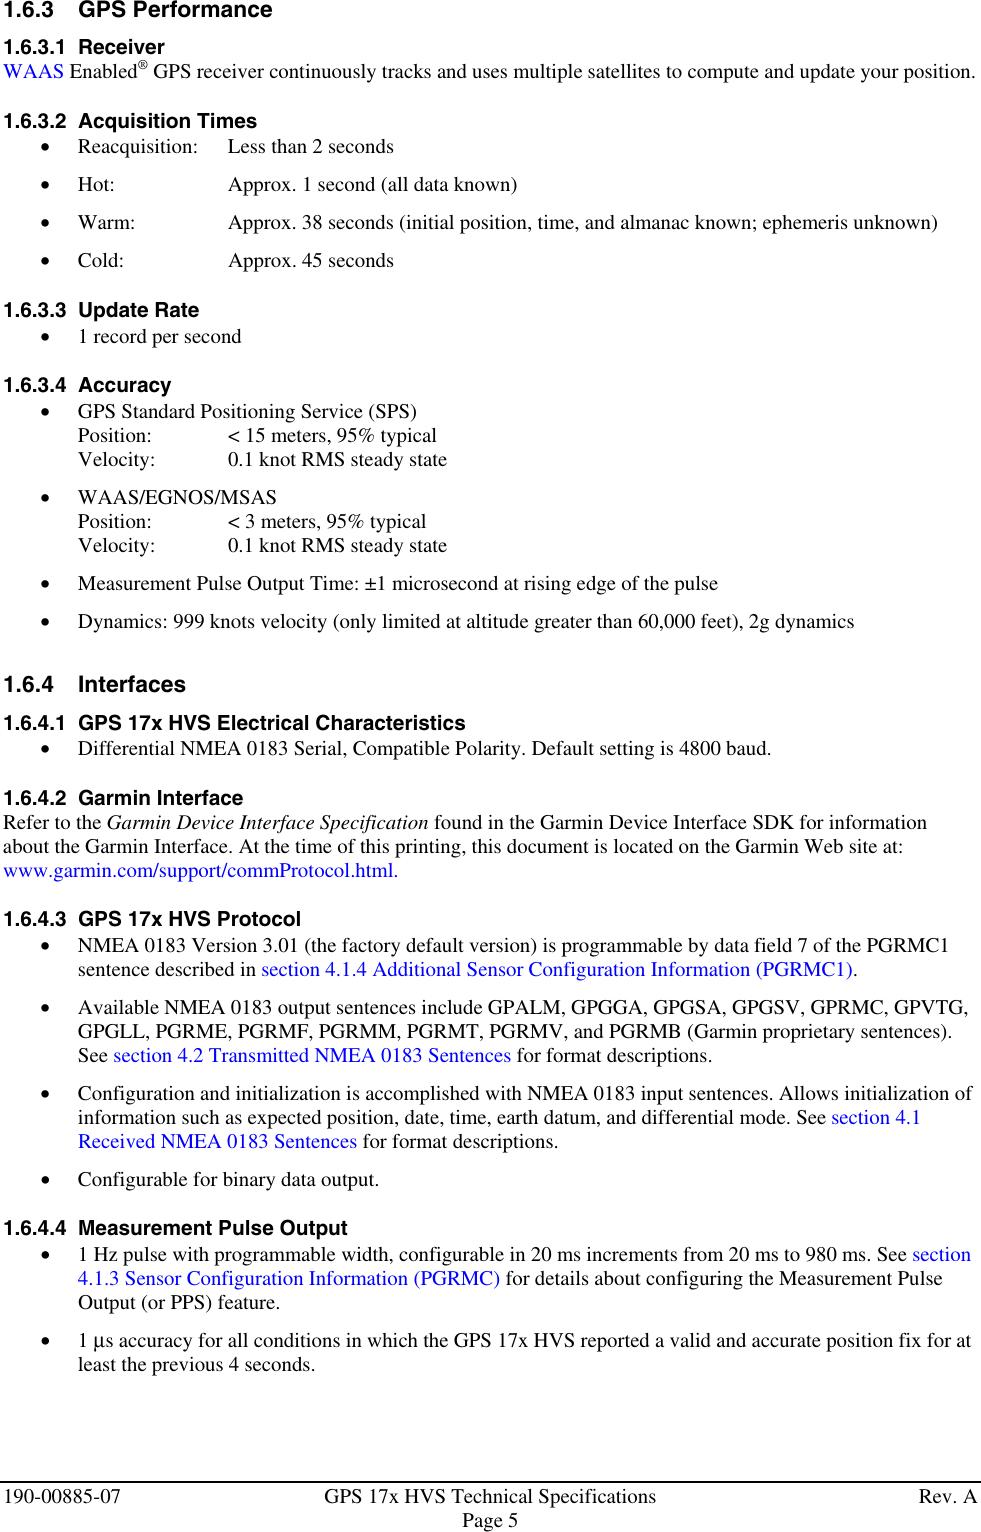 Garmin Hvs Gps17 Users Manual